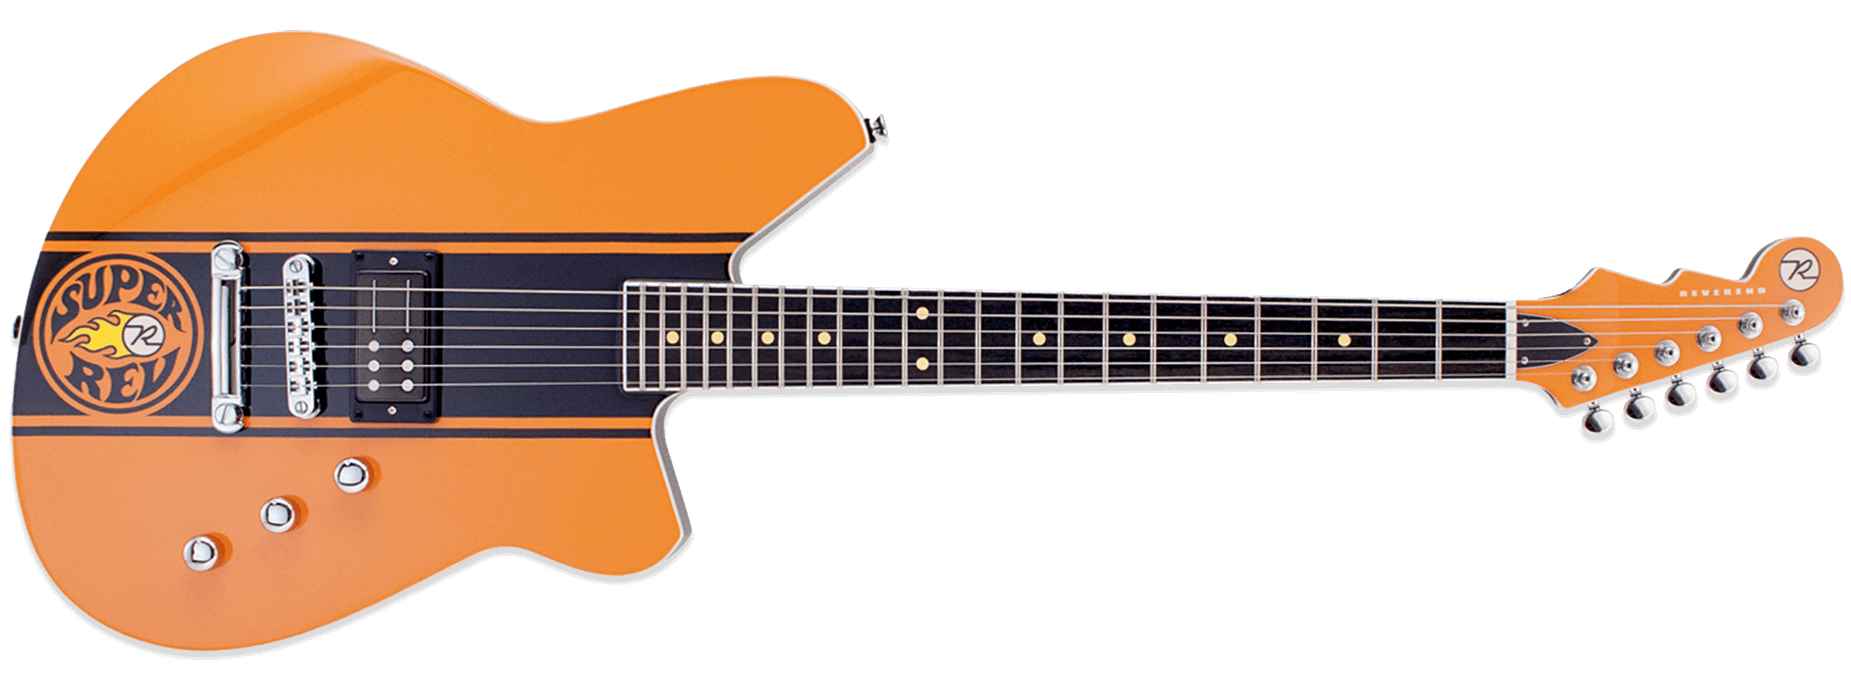 Reverend Super Rev 69 Orange